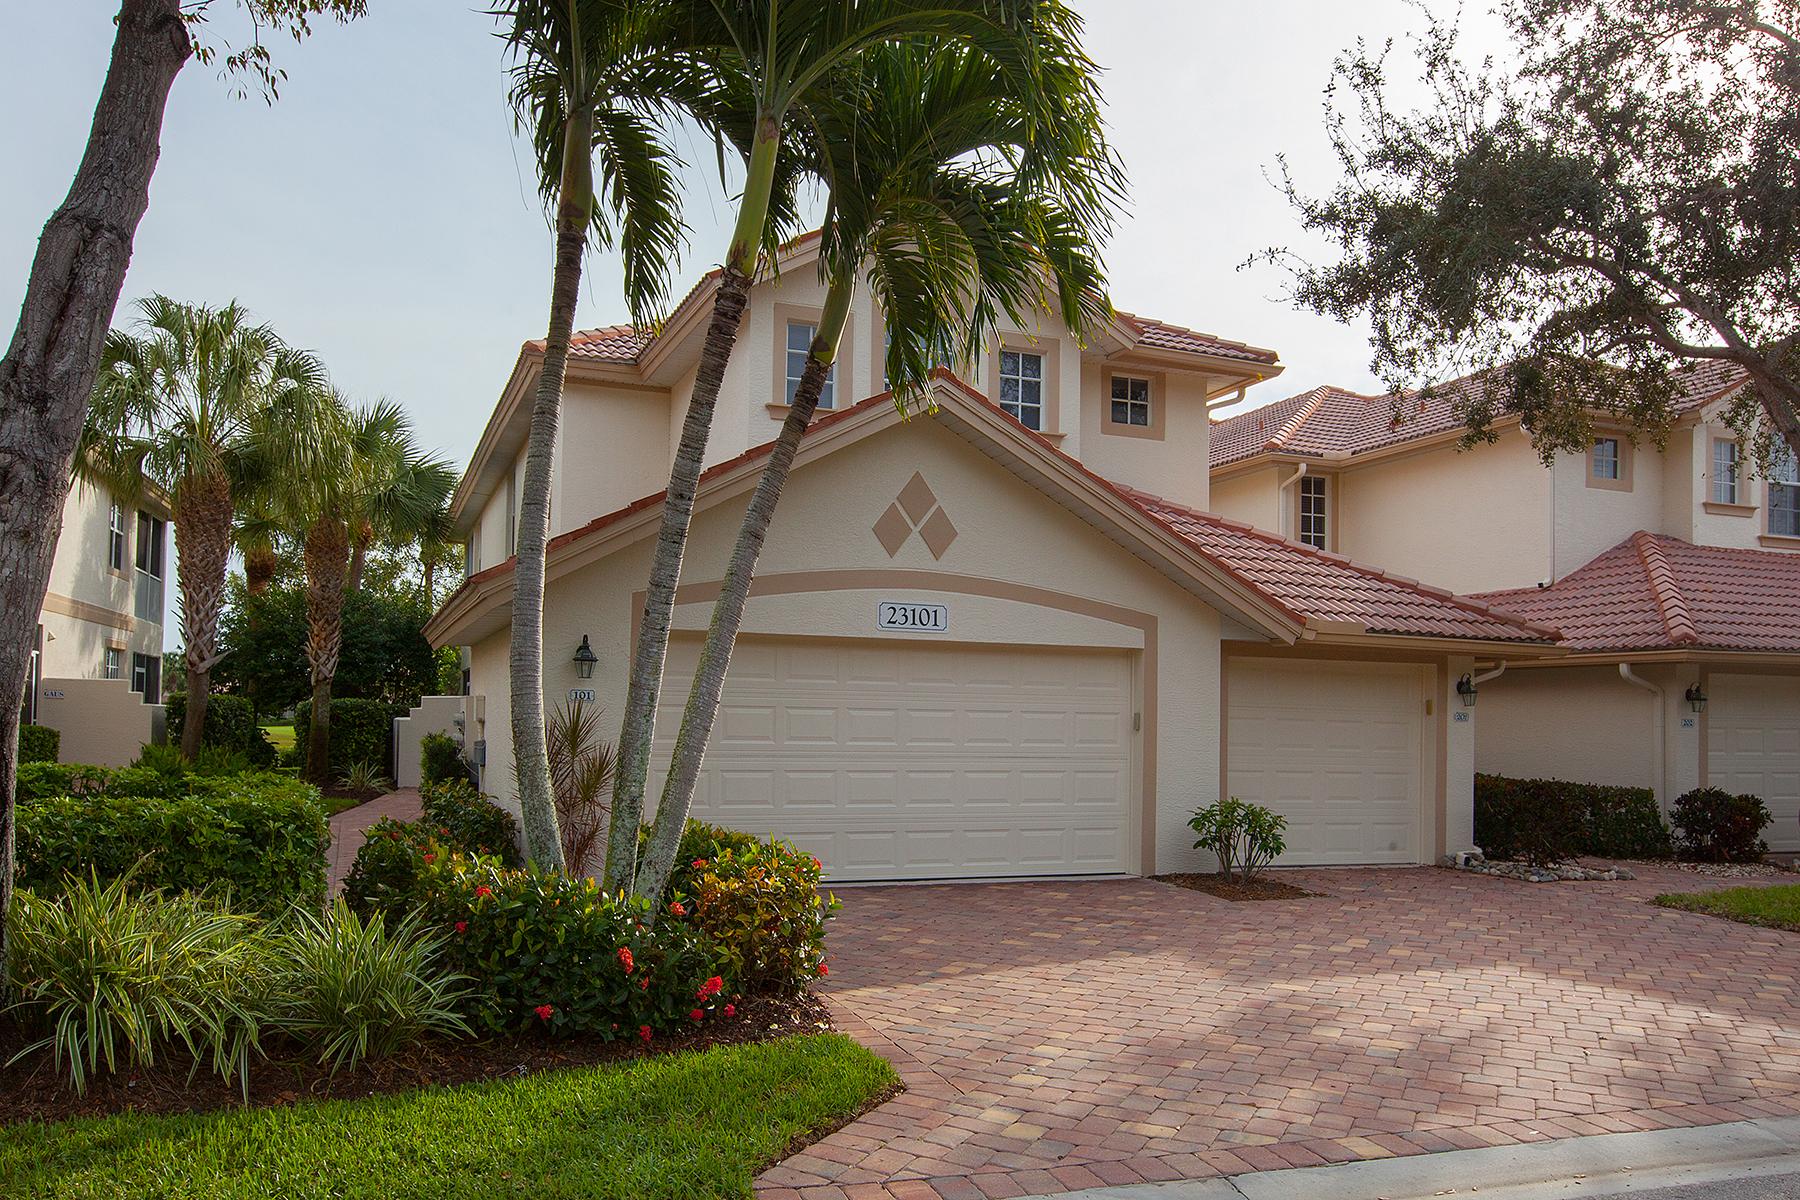 Condomínio para Venda às MORNINGSIDE 23101 Rosedale Dr 101 Bonita Springs, Florida, 34135 Estados Unidos